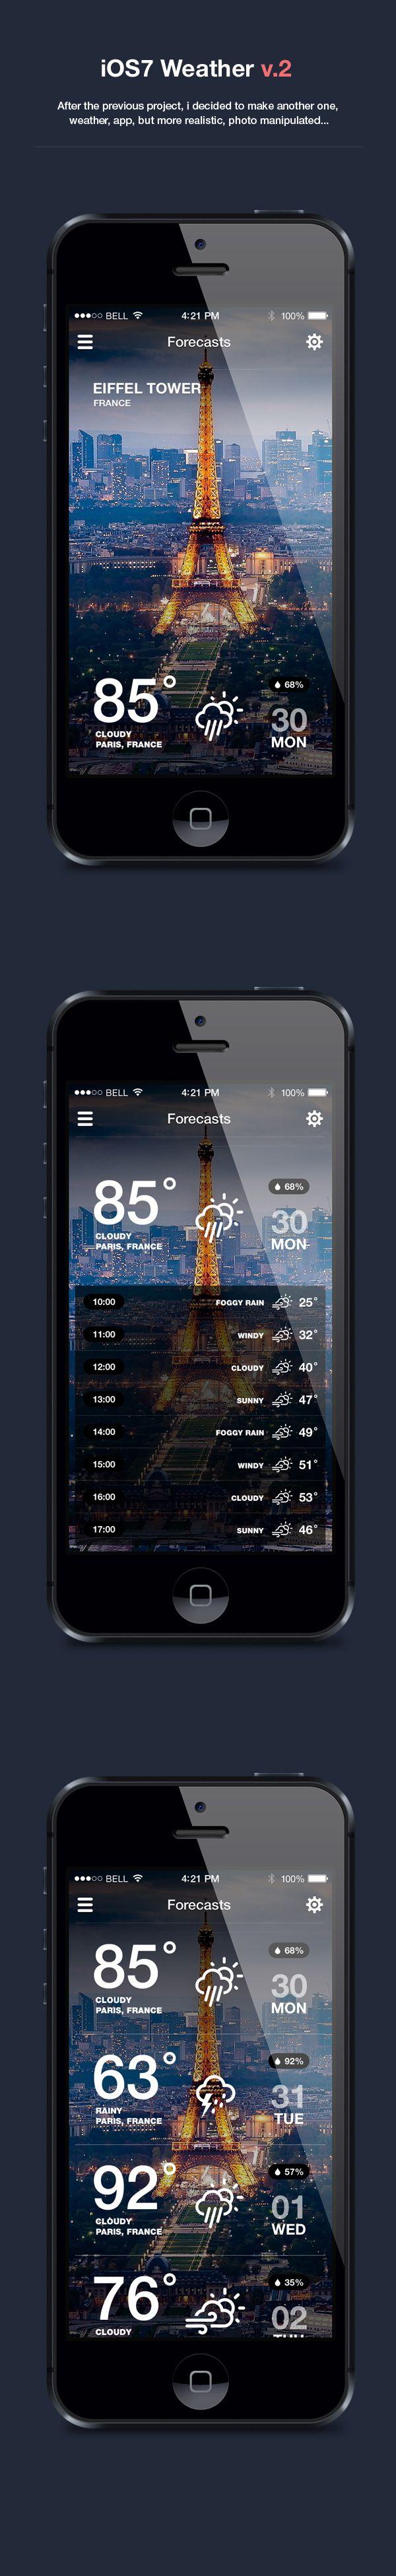 iOS7 Weather App v.2 by Dmitriy Haraberush, via Behance